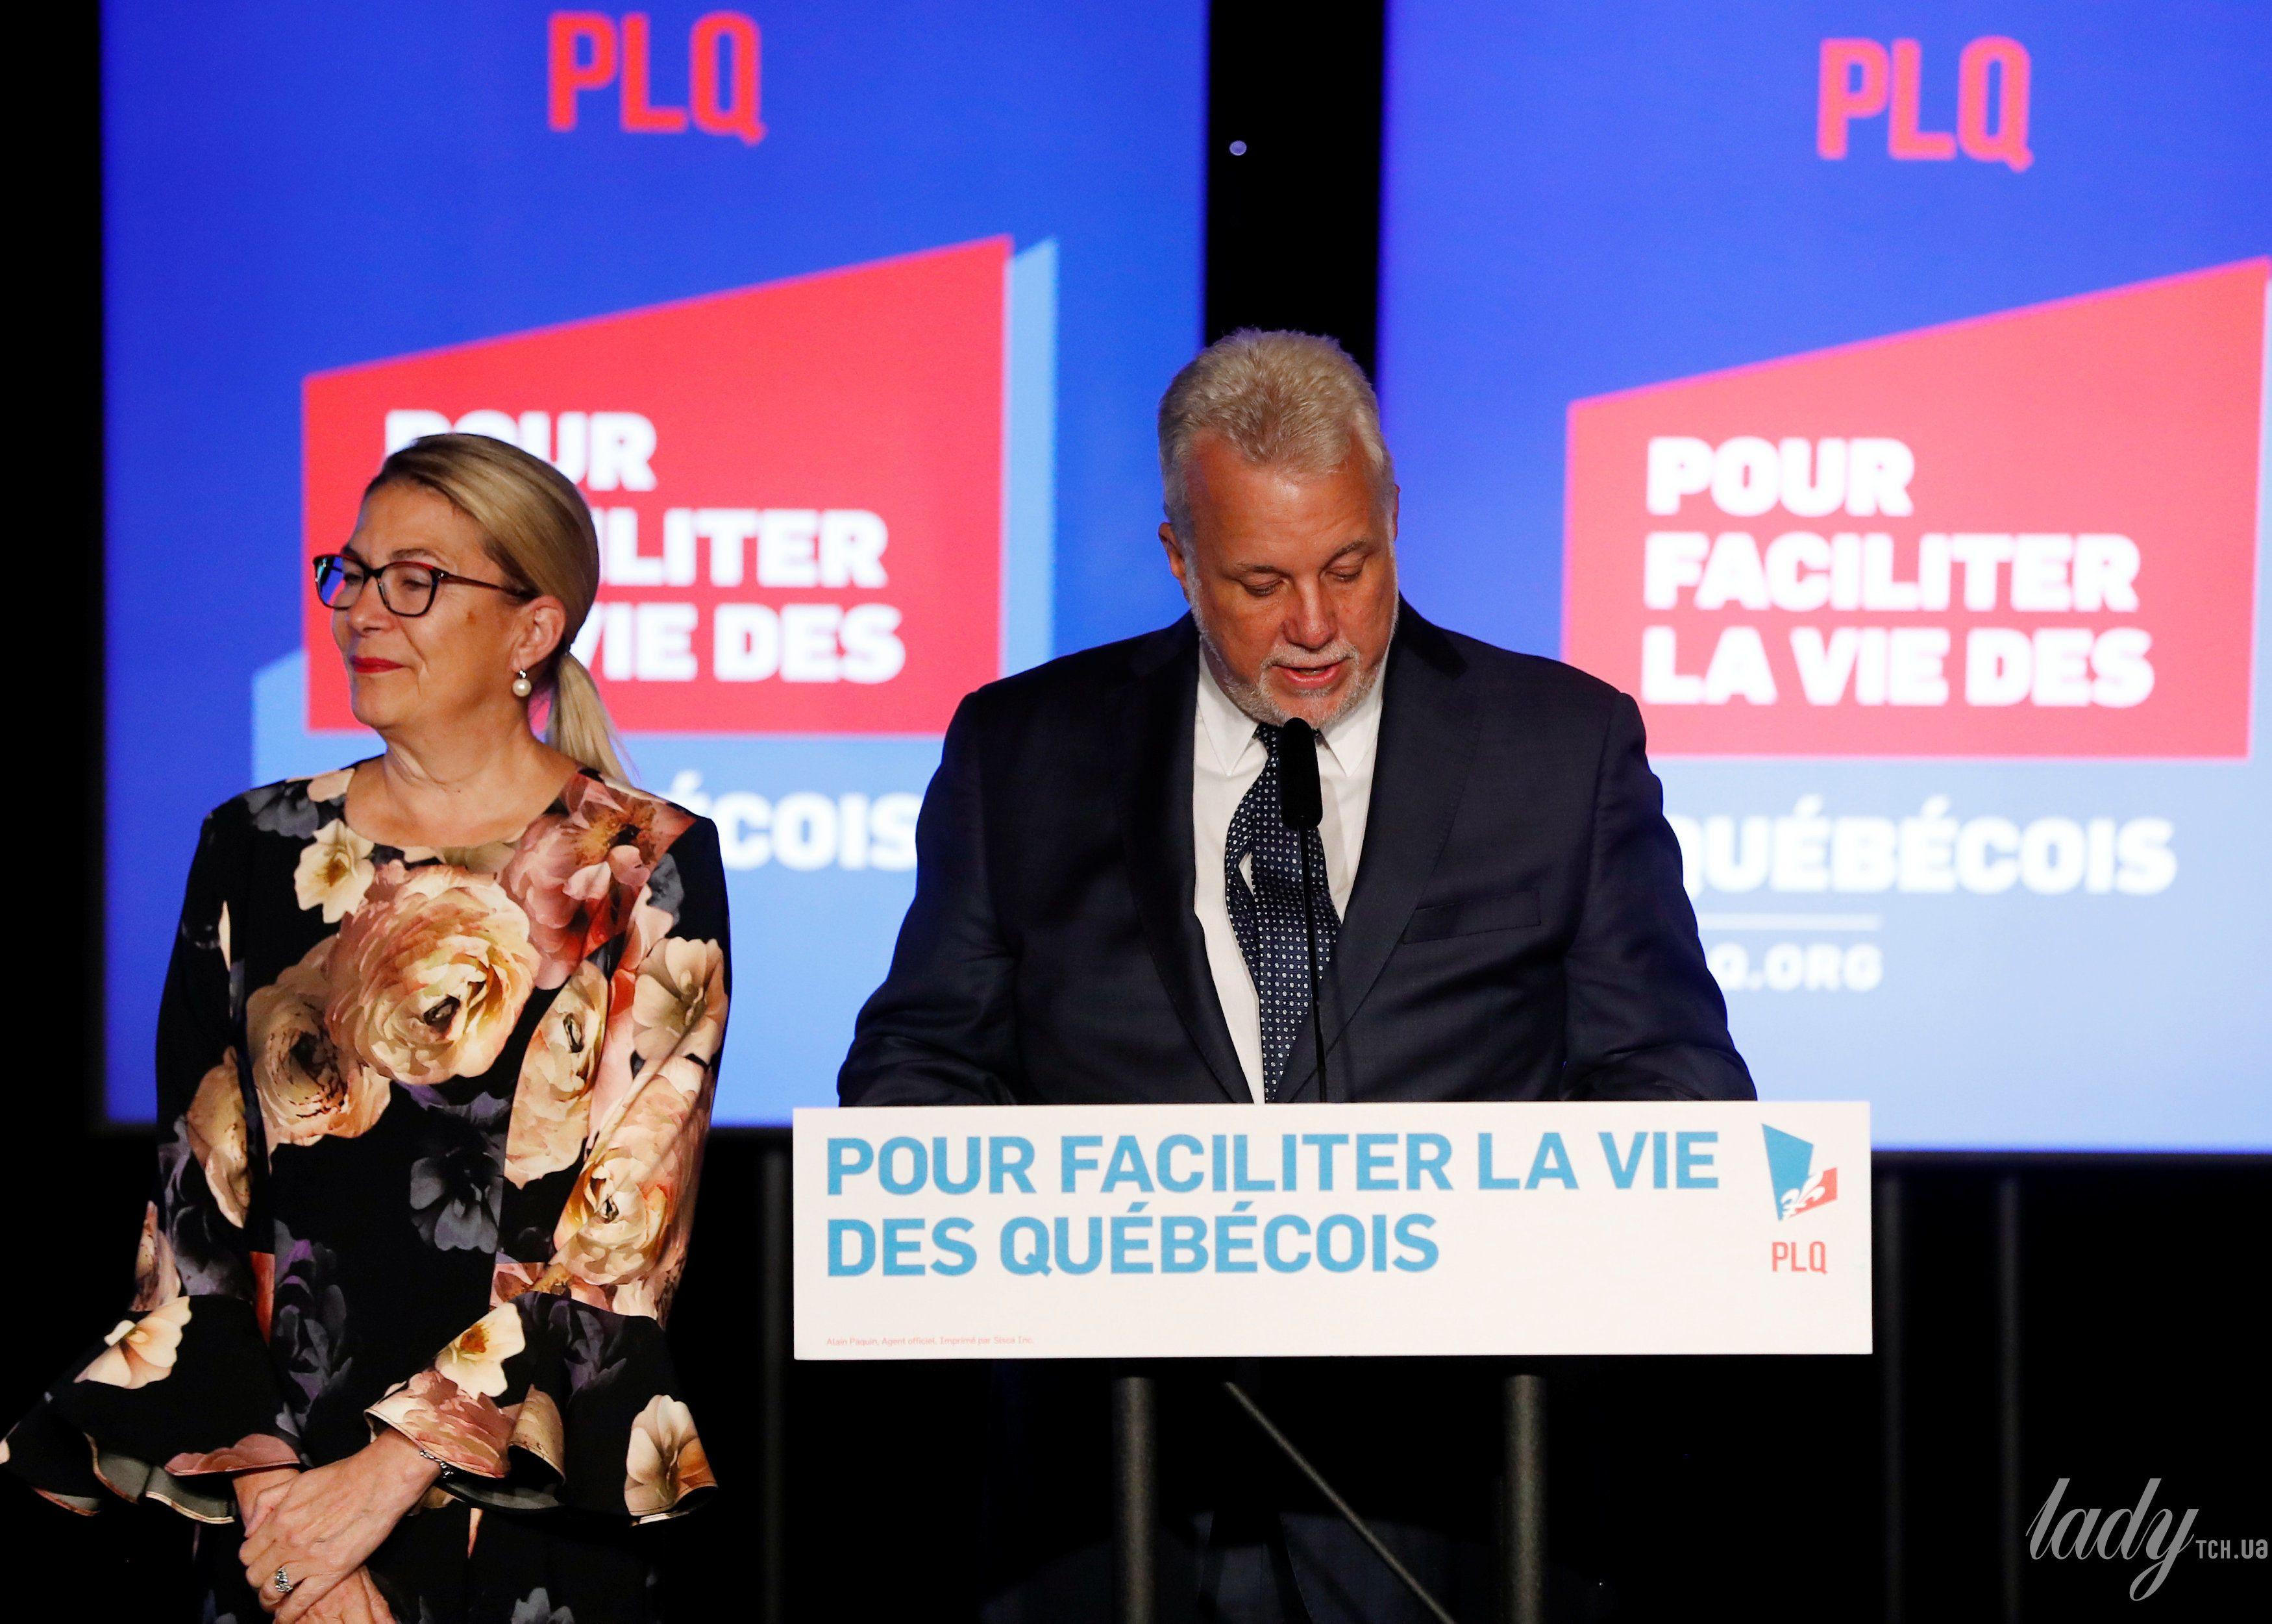 Жена премьер-министра Квебека_1